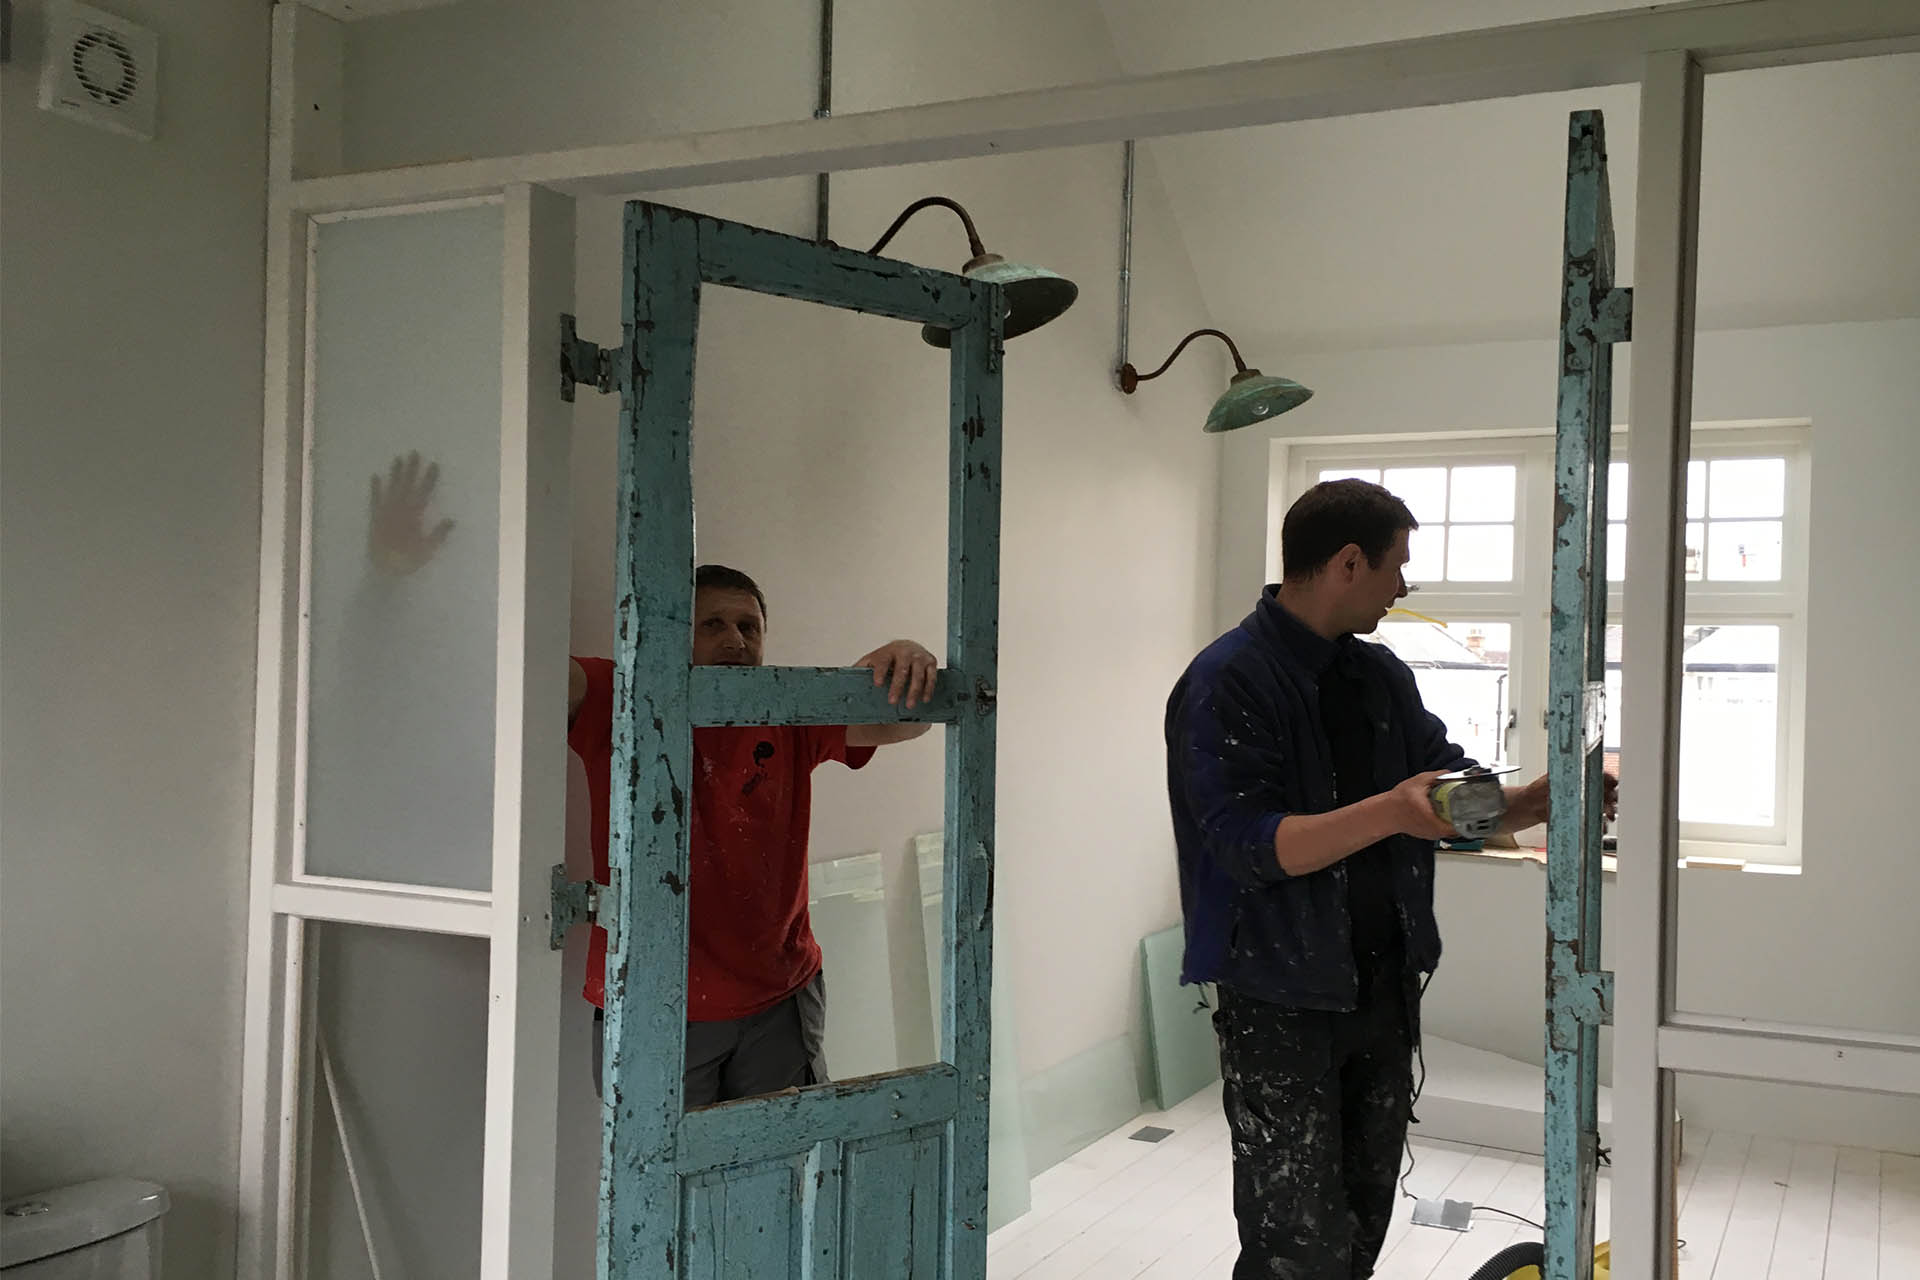 NW10 project installing doors